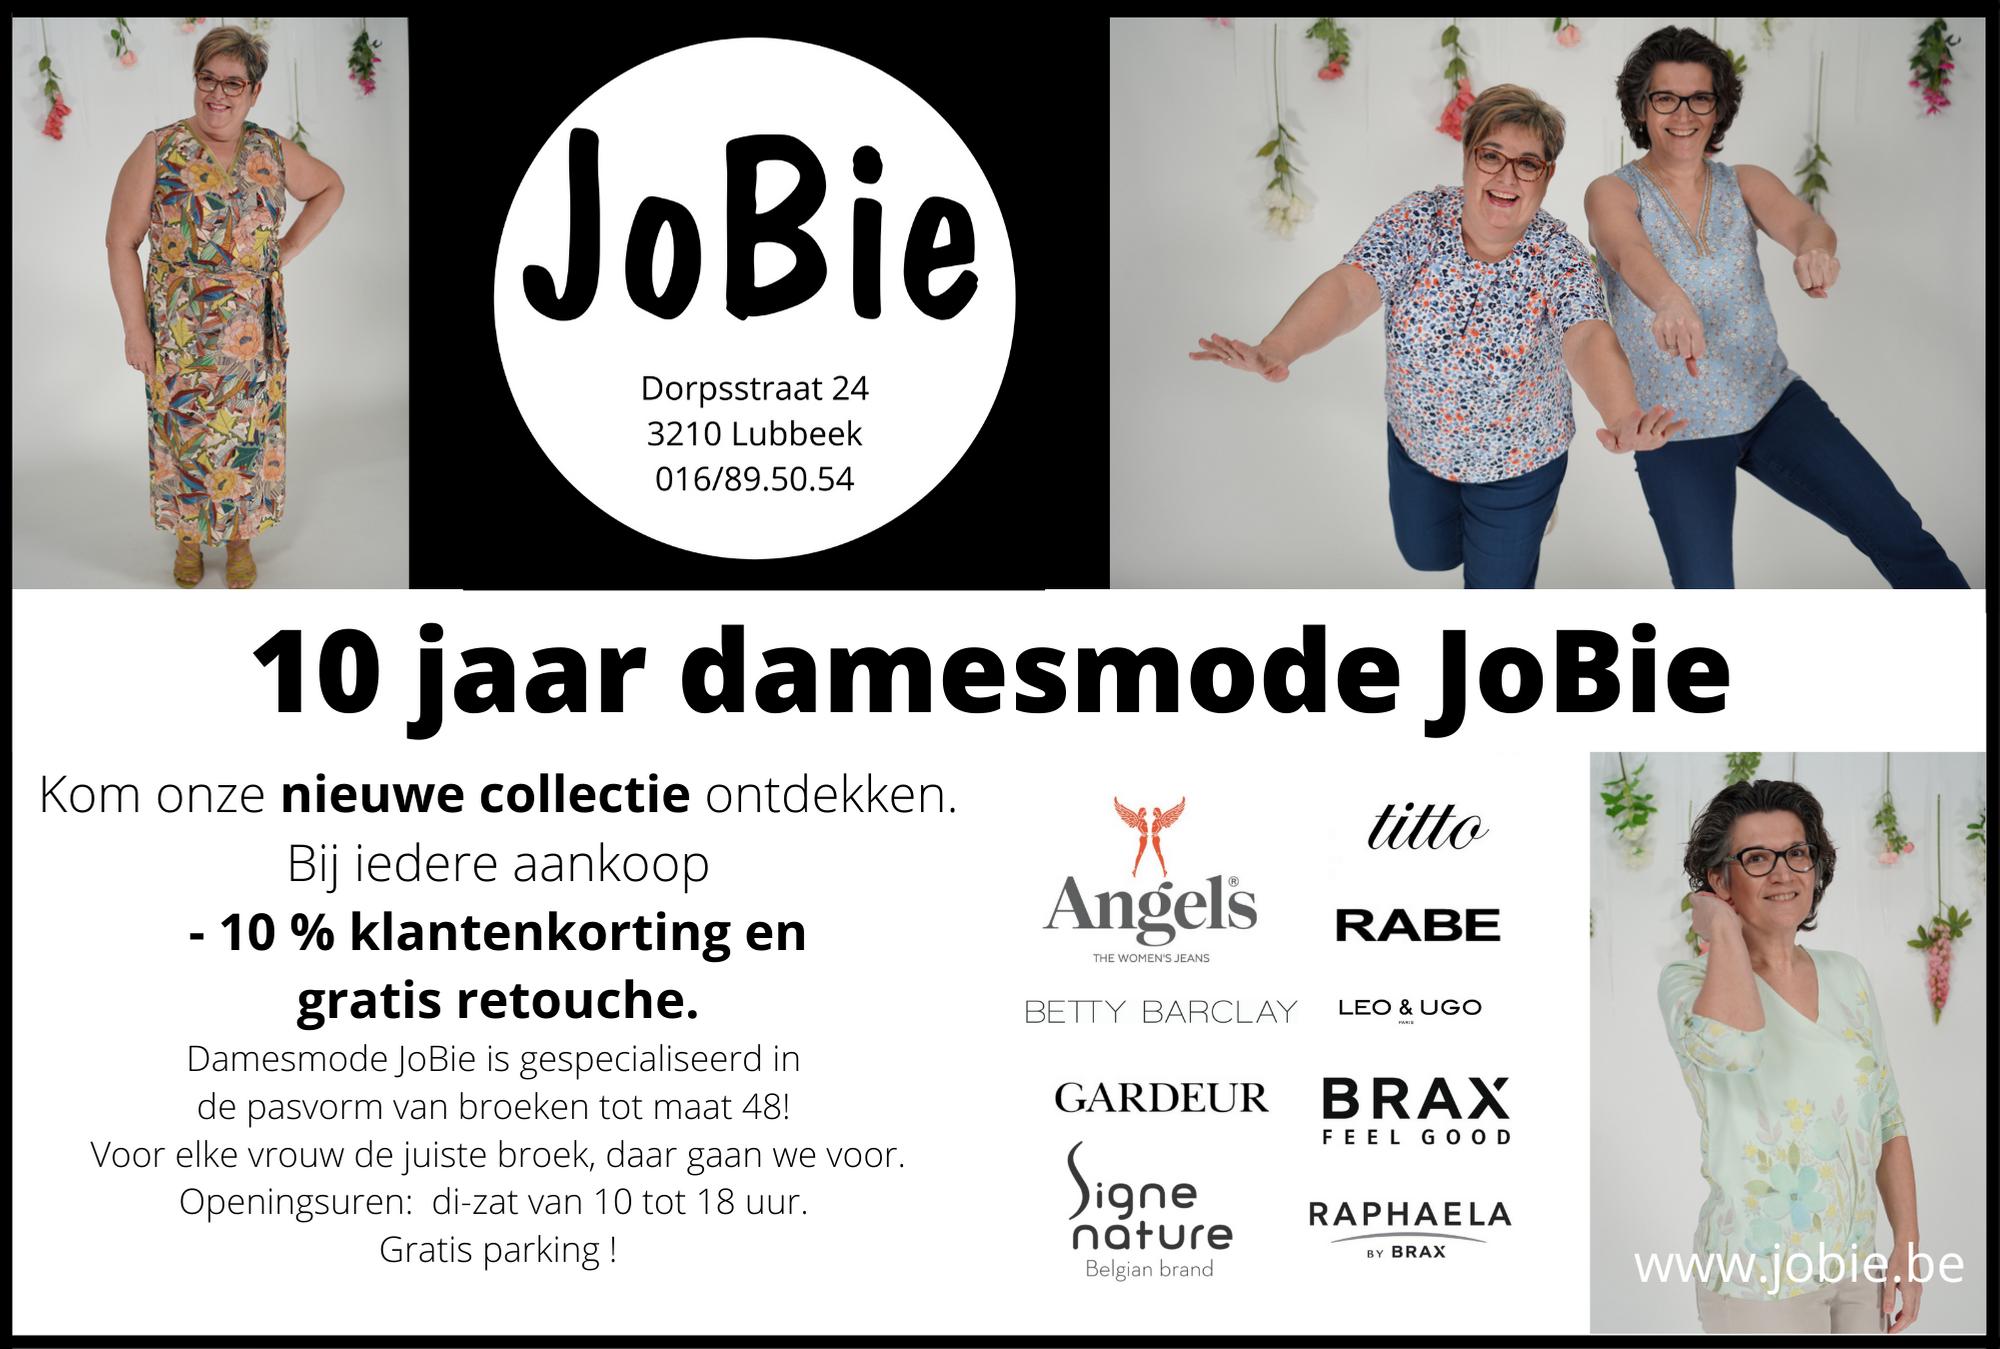 JoBie damesmode viert feest 10 jaar @lubbeek